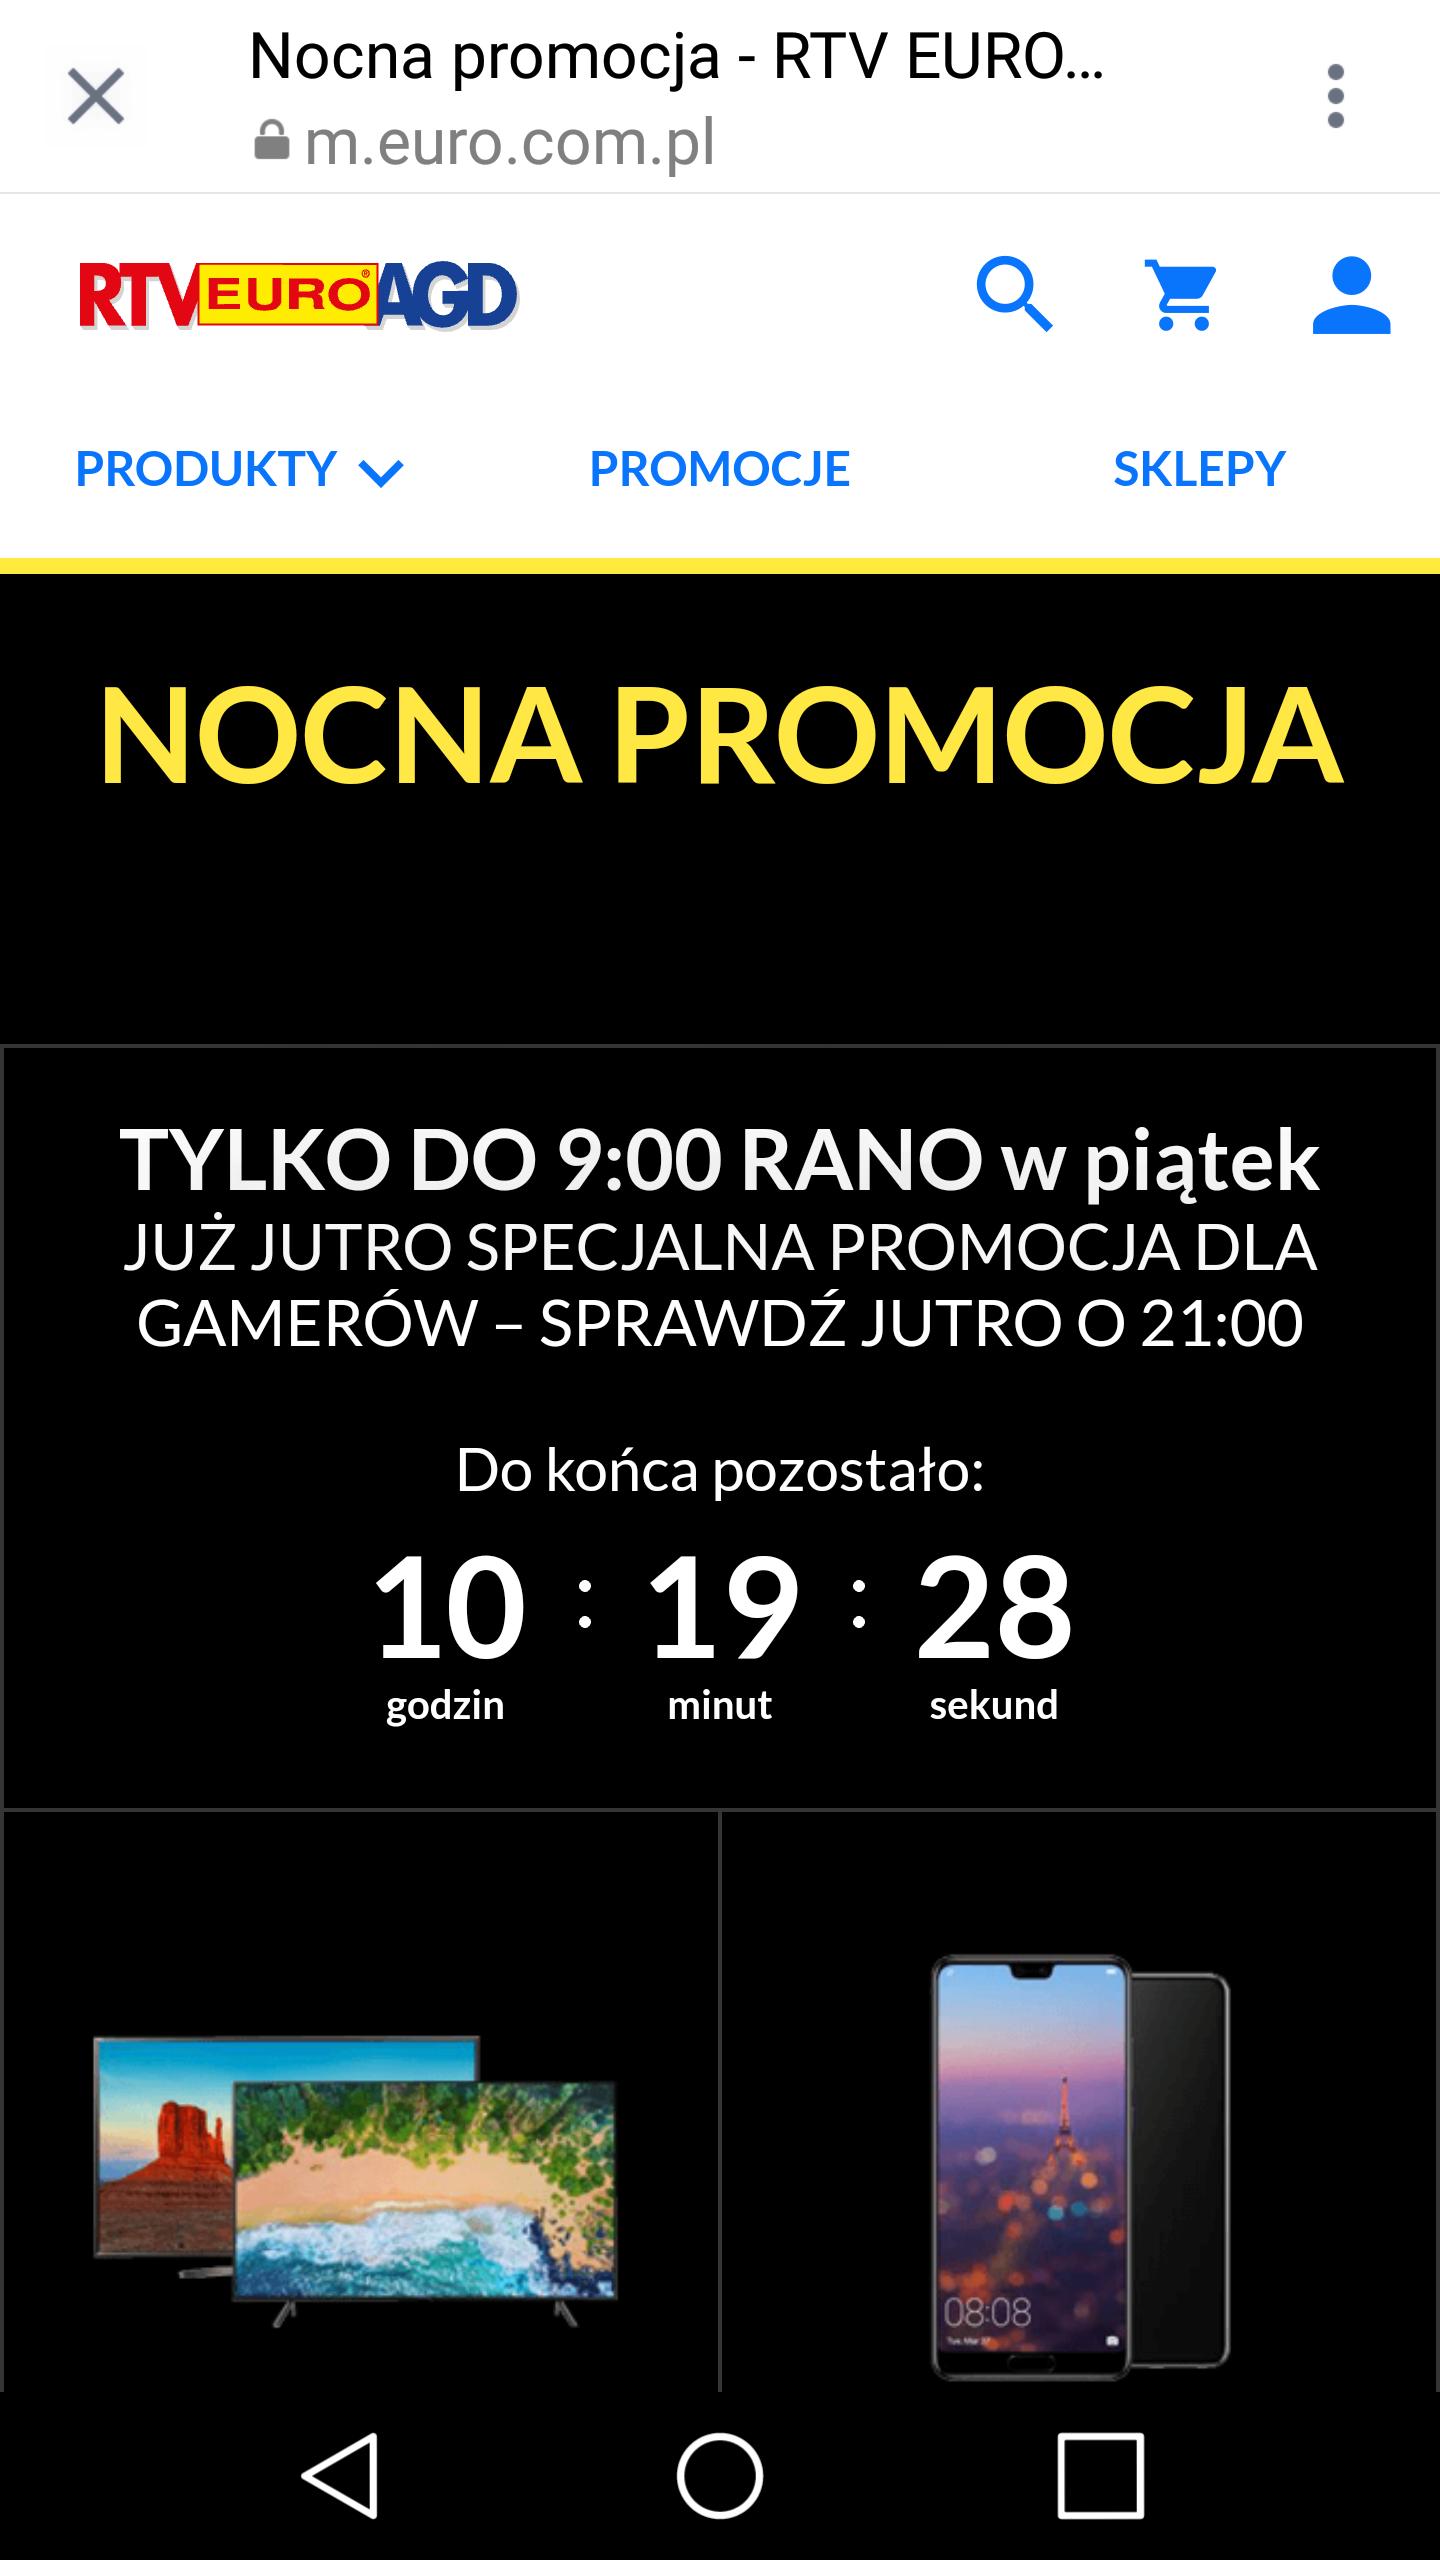 Nocna promocja euro.com.pl RTV euro AGD